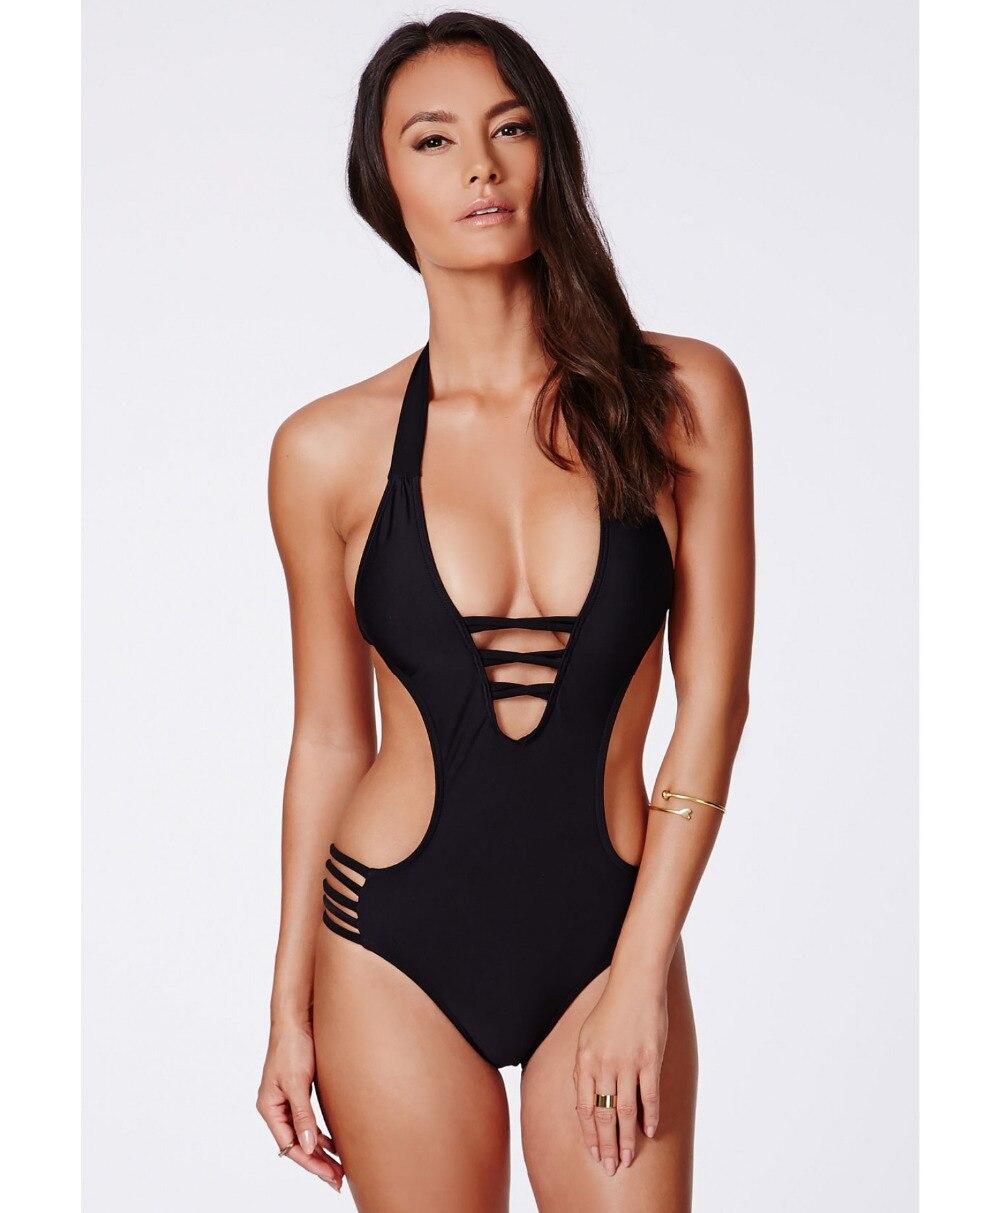 Merek Swimwear Wanita Tinggi Pinggang One Piece Swimsuit Sexy Monokini Baju  renang Womens Perban Swimsuit Hitam Swimwear b0f3db9689